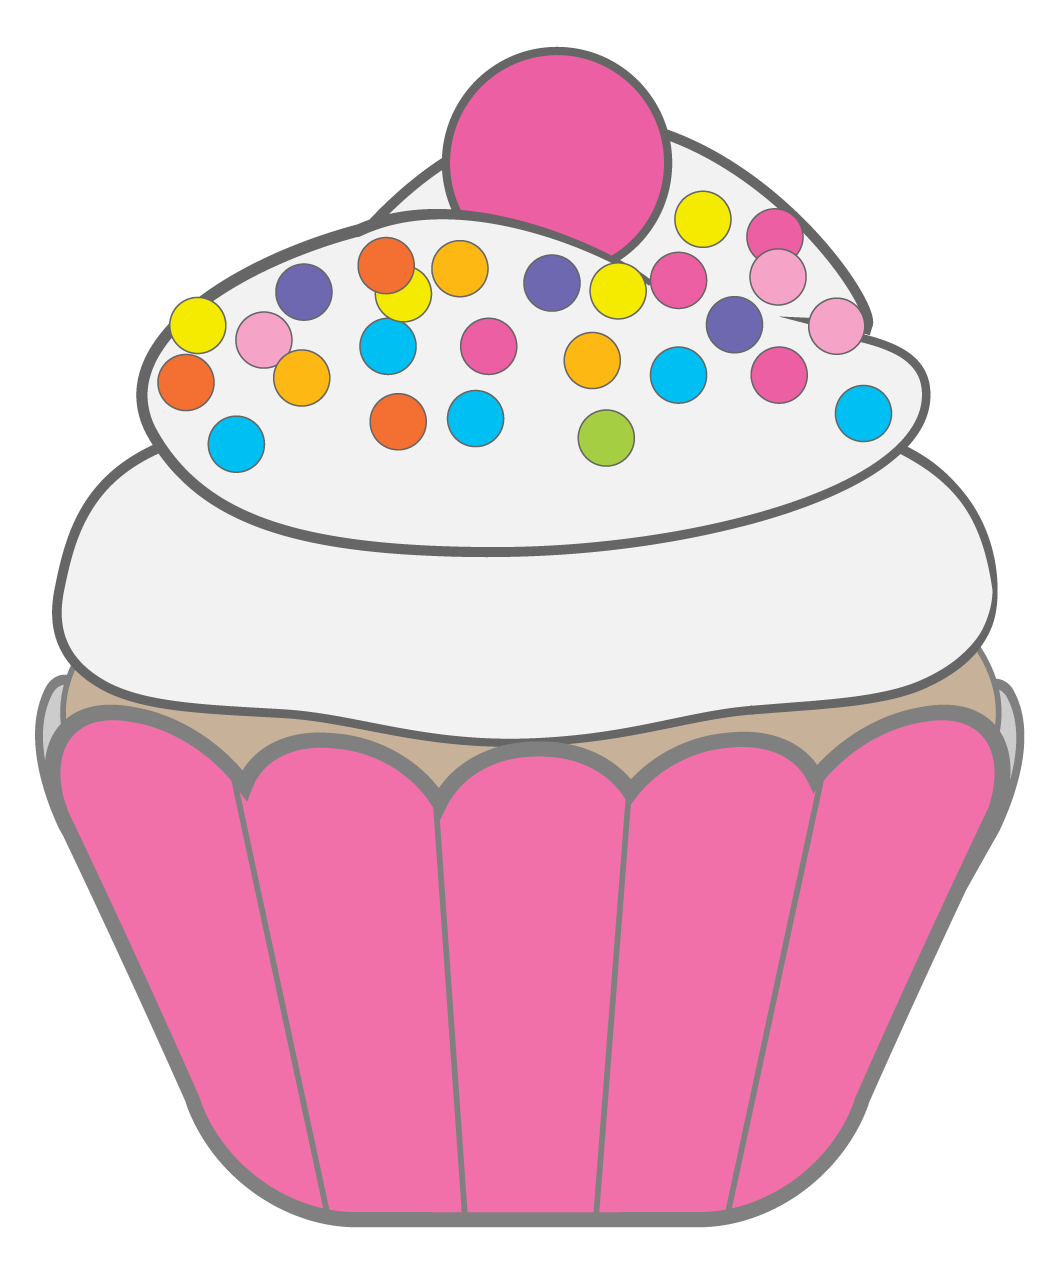 happy birthday cupcake clipart-happy birthday cupcake clipart-2